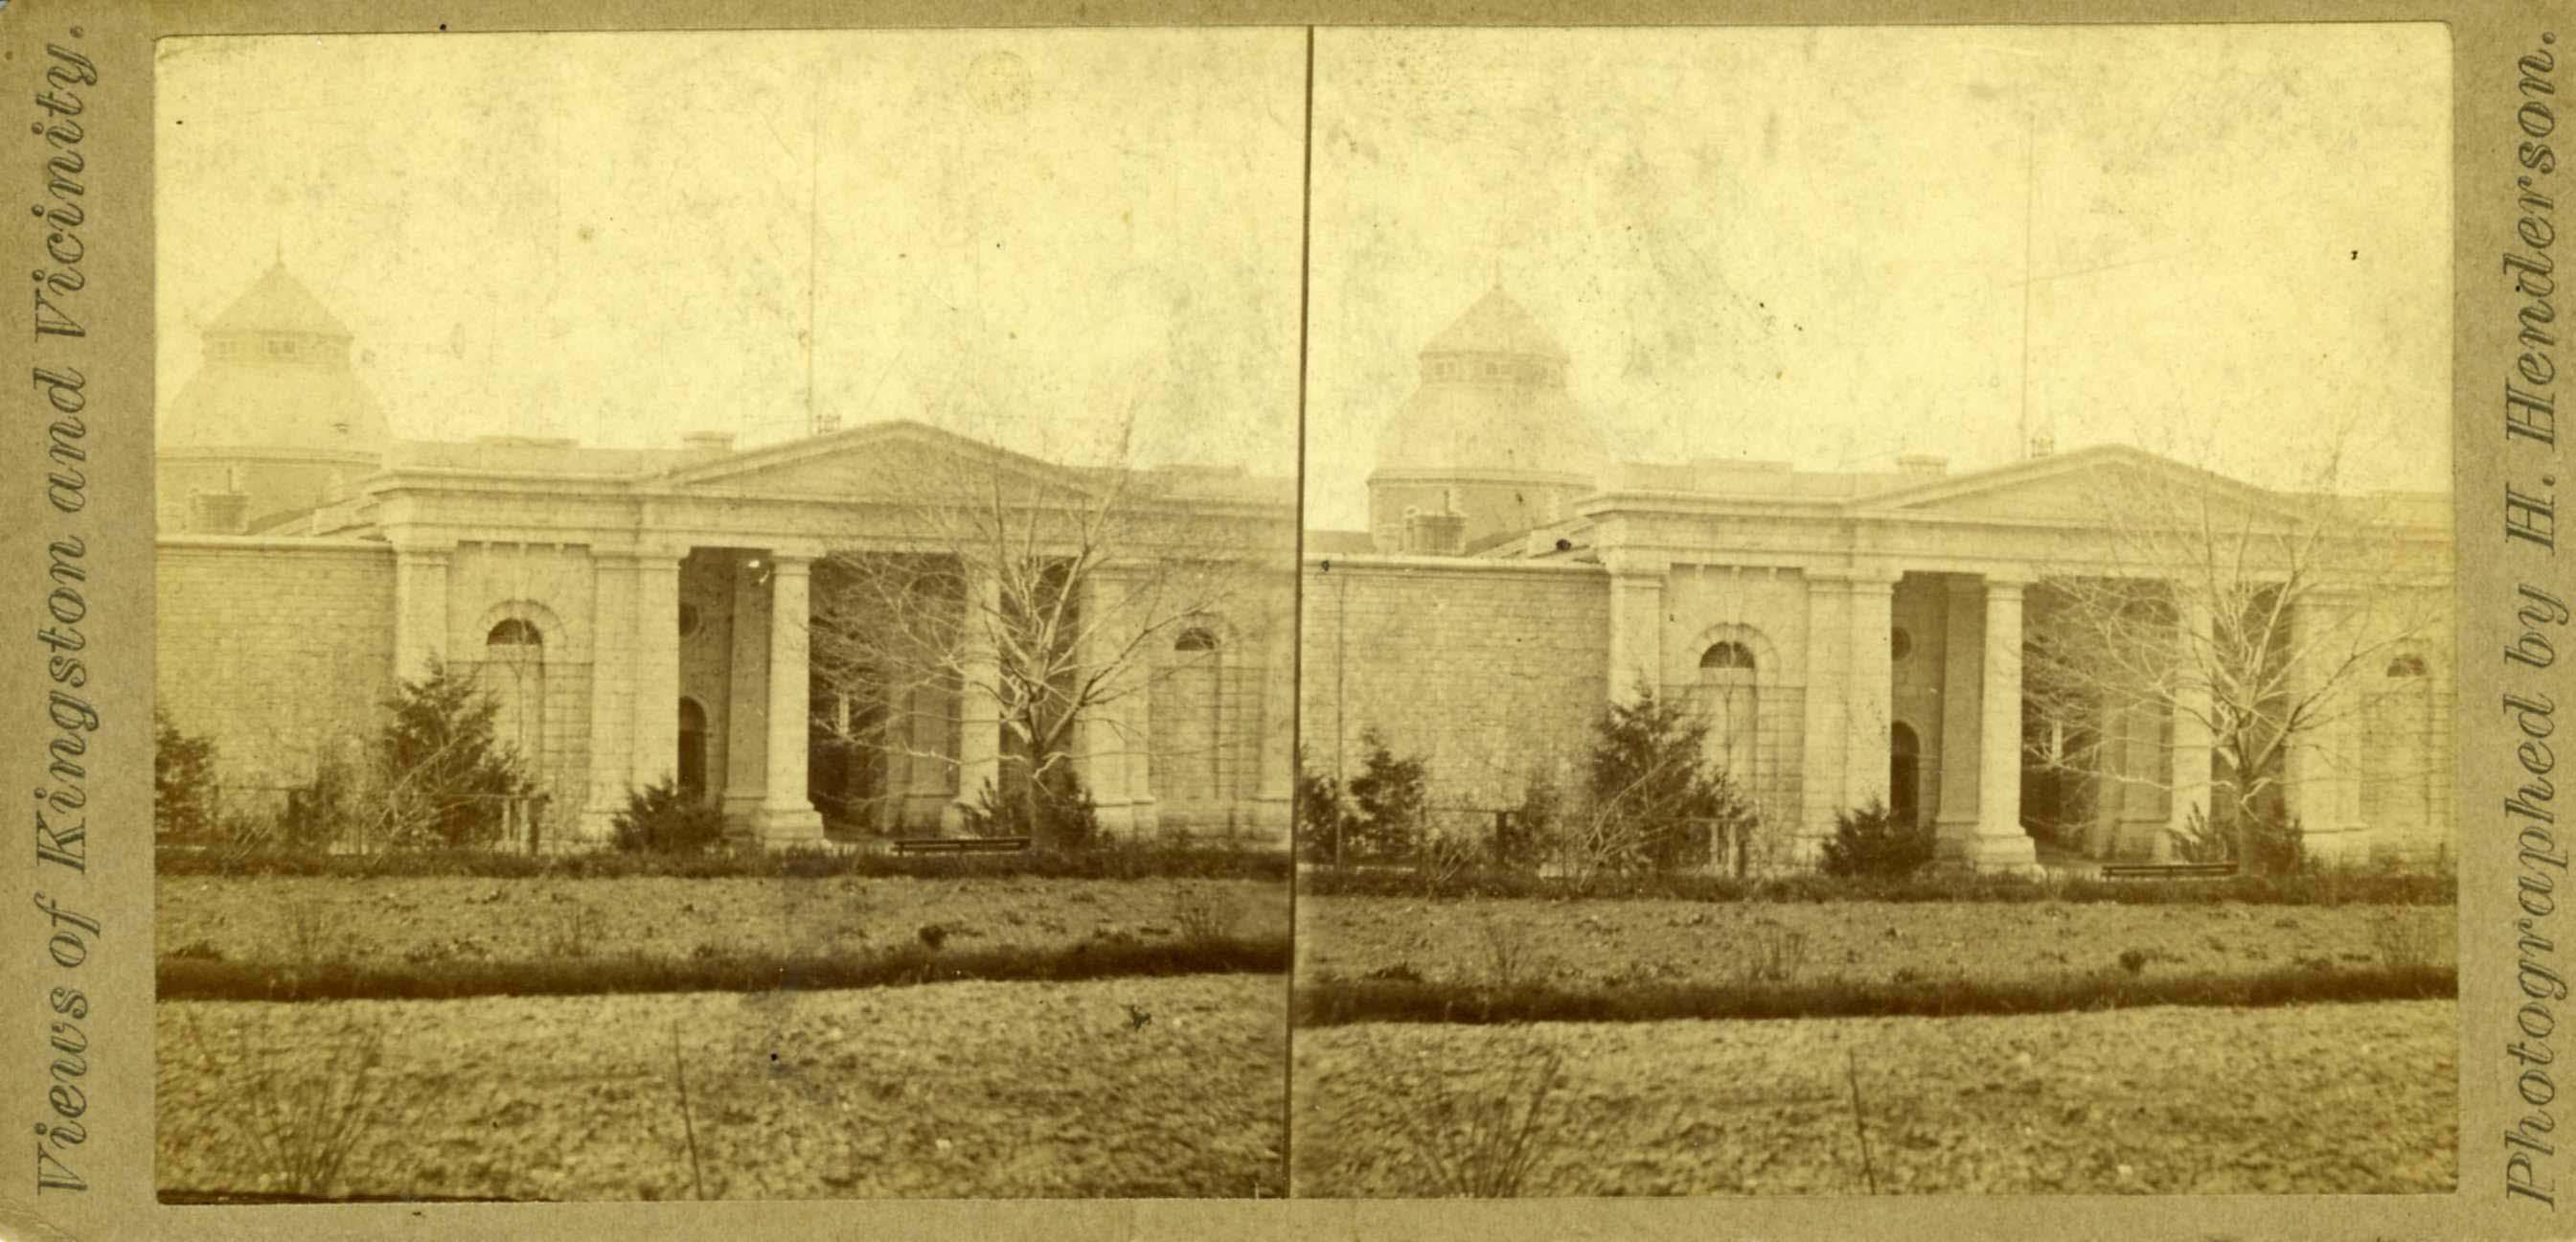 Stereoscopic photograph of Kingston Penitentiary taken by H. Henderson, circa 1890